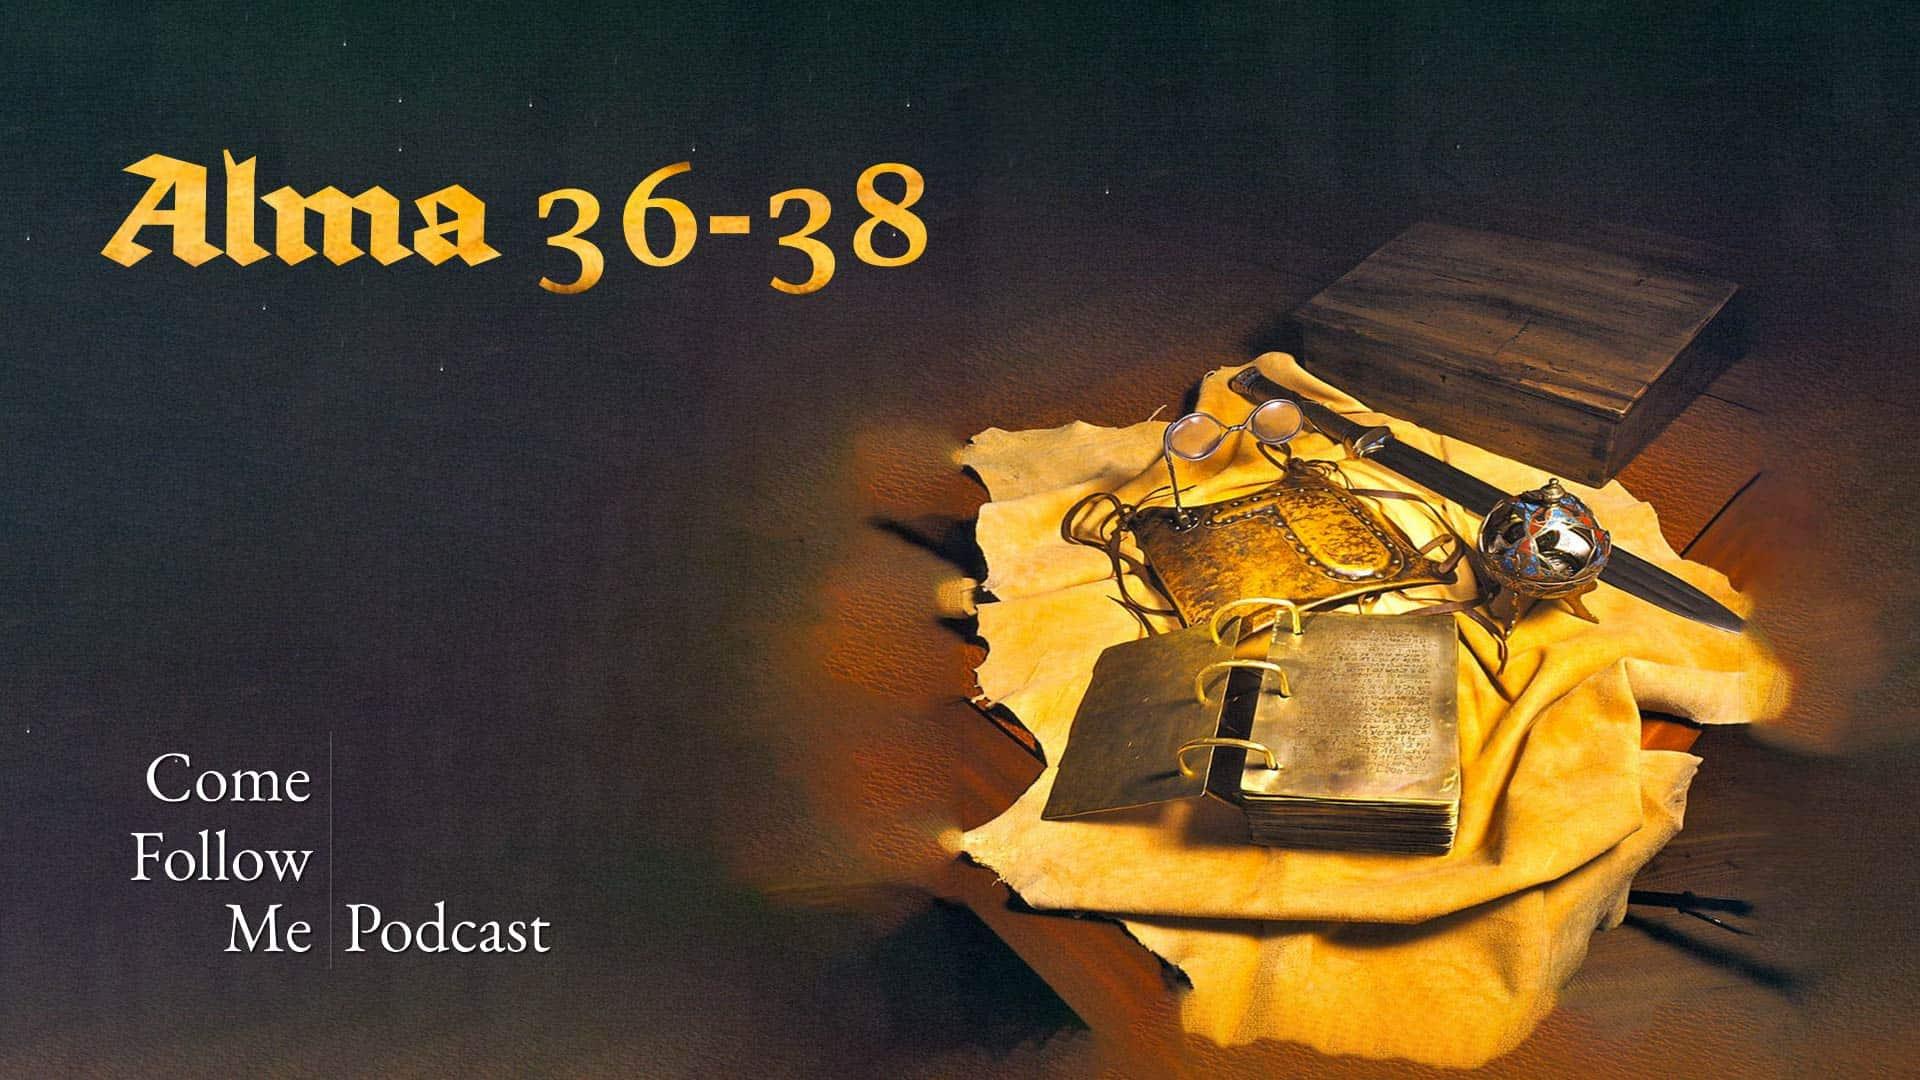 Alma 36-38